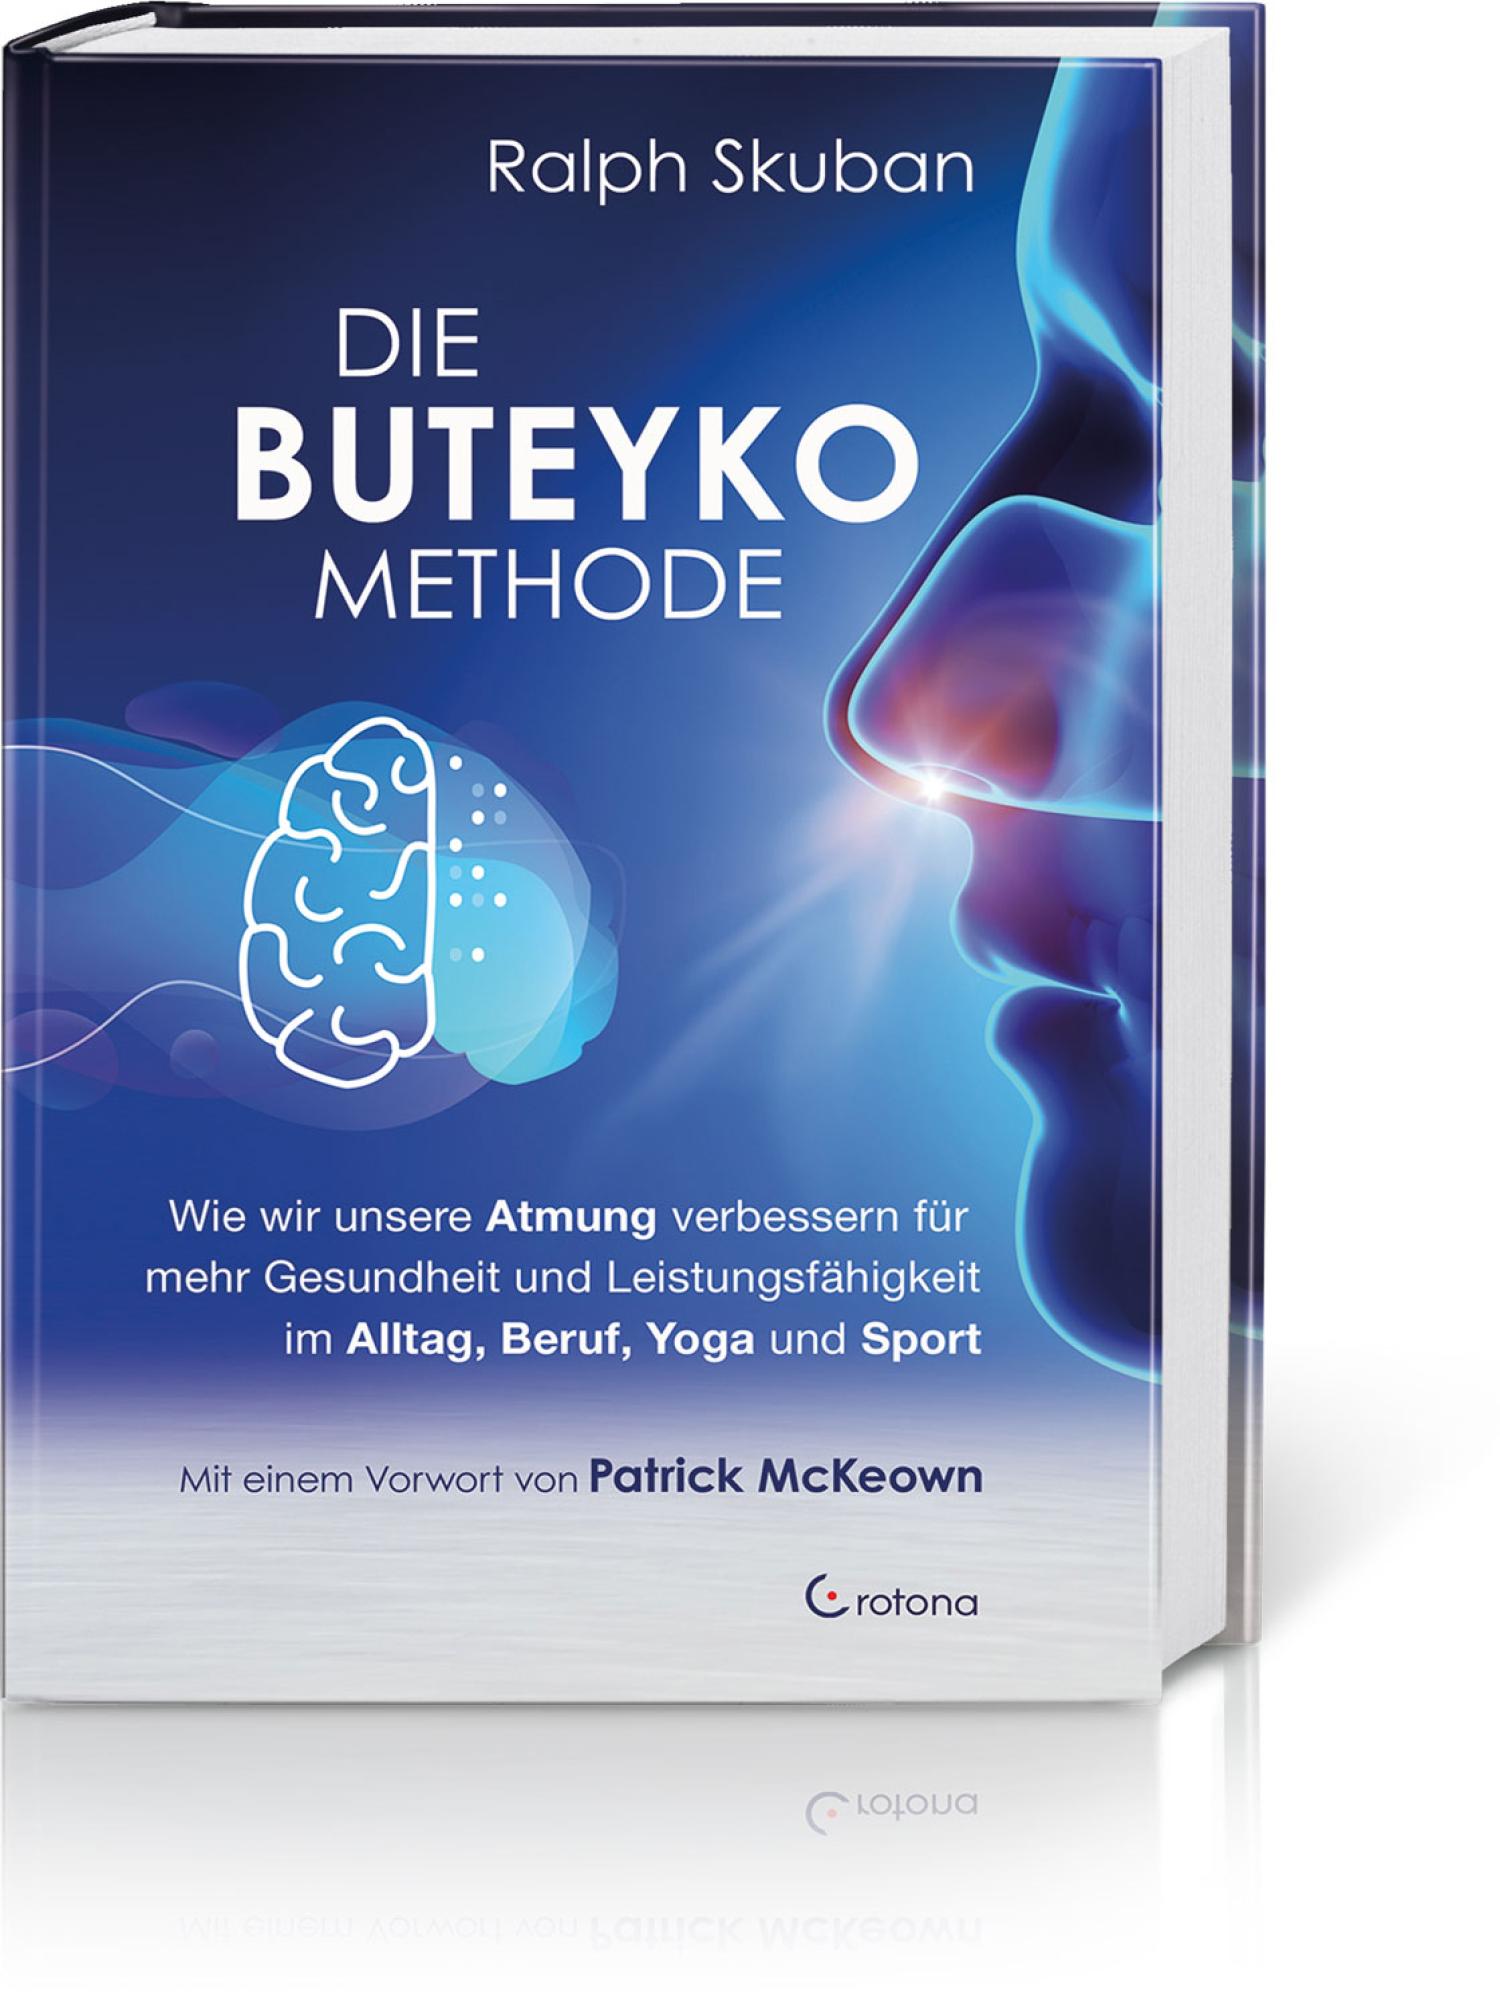 Die Buteyko-Methode, Produktbild 1